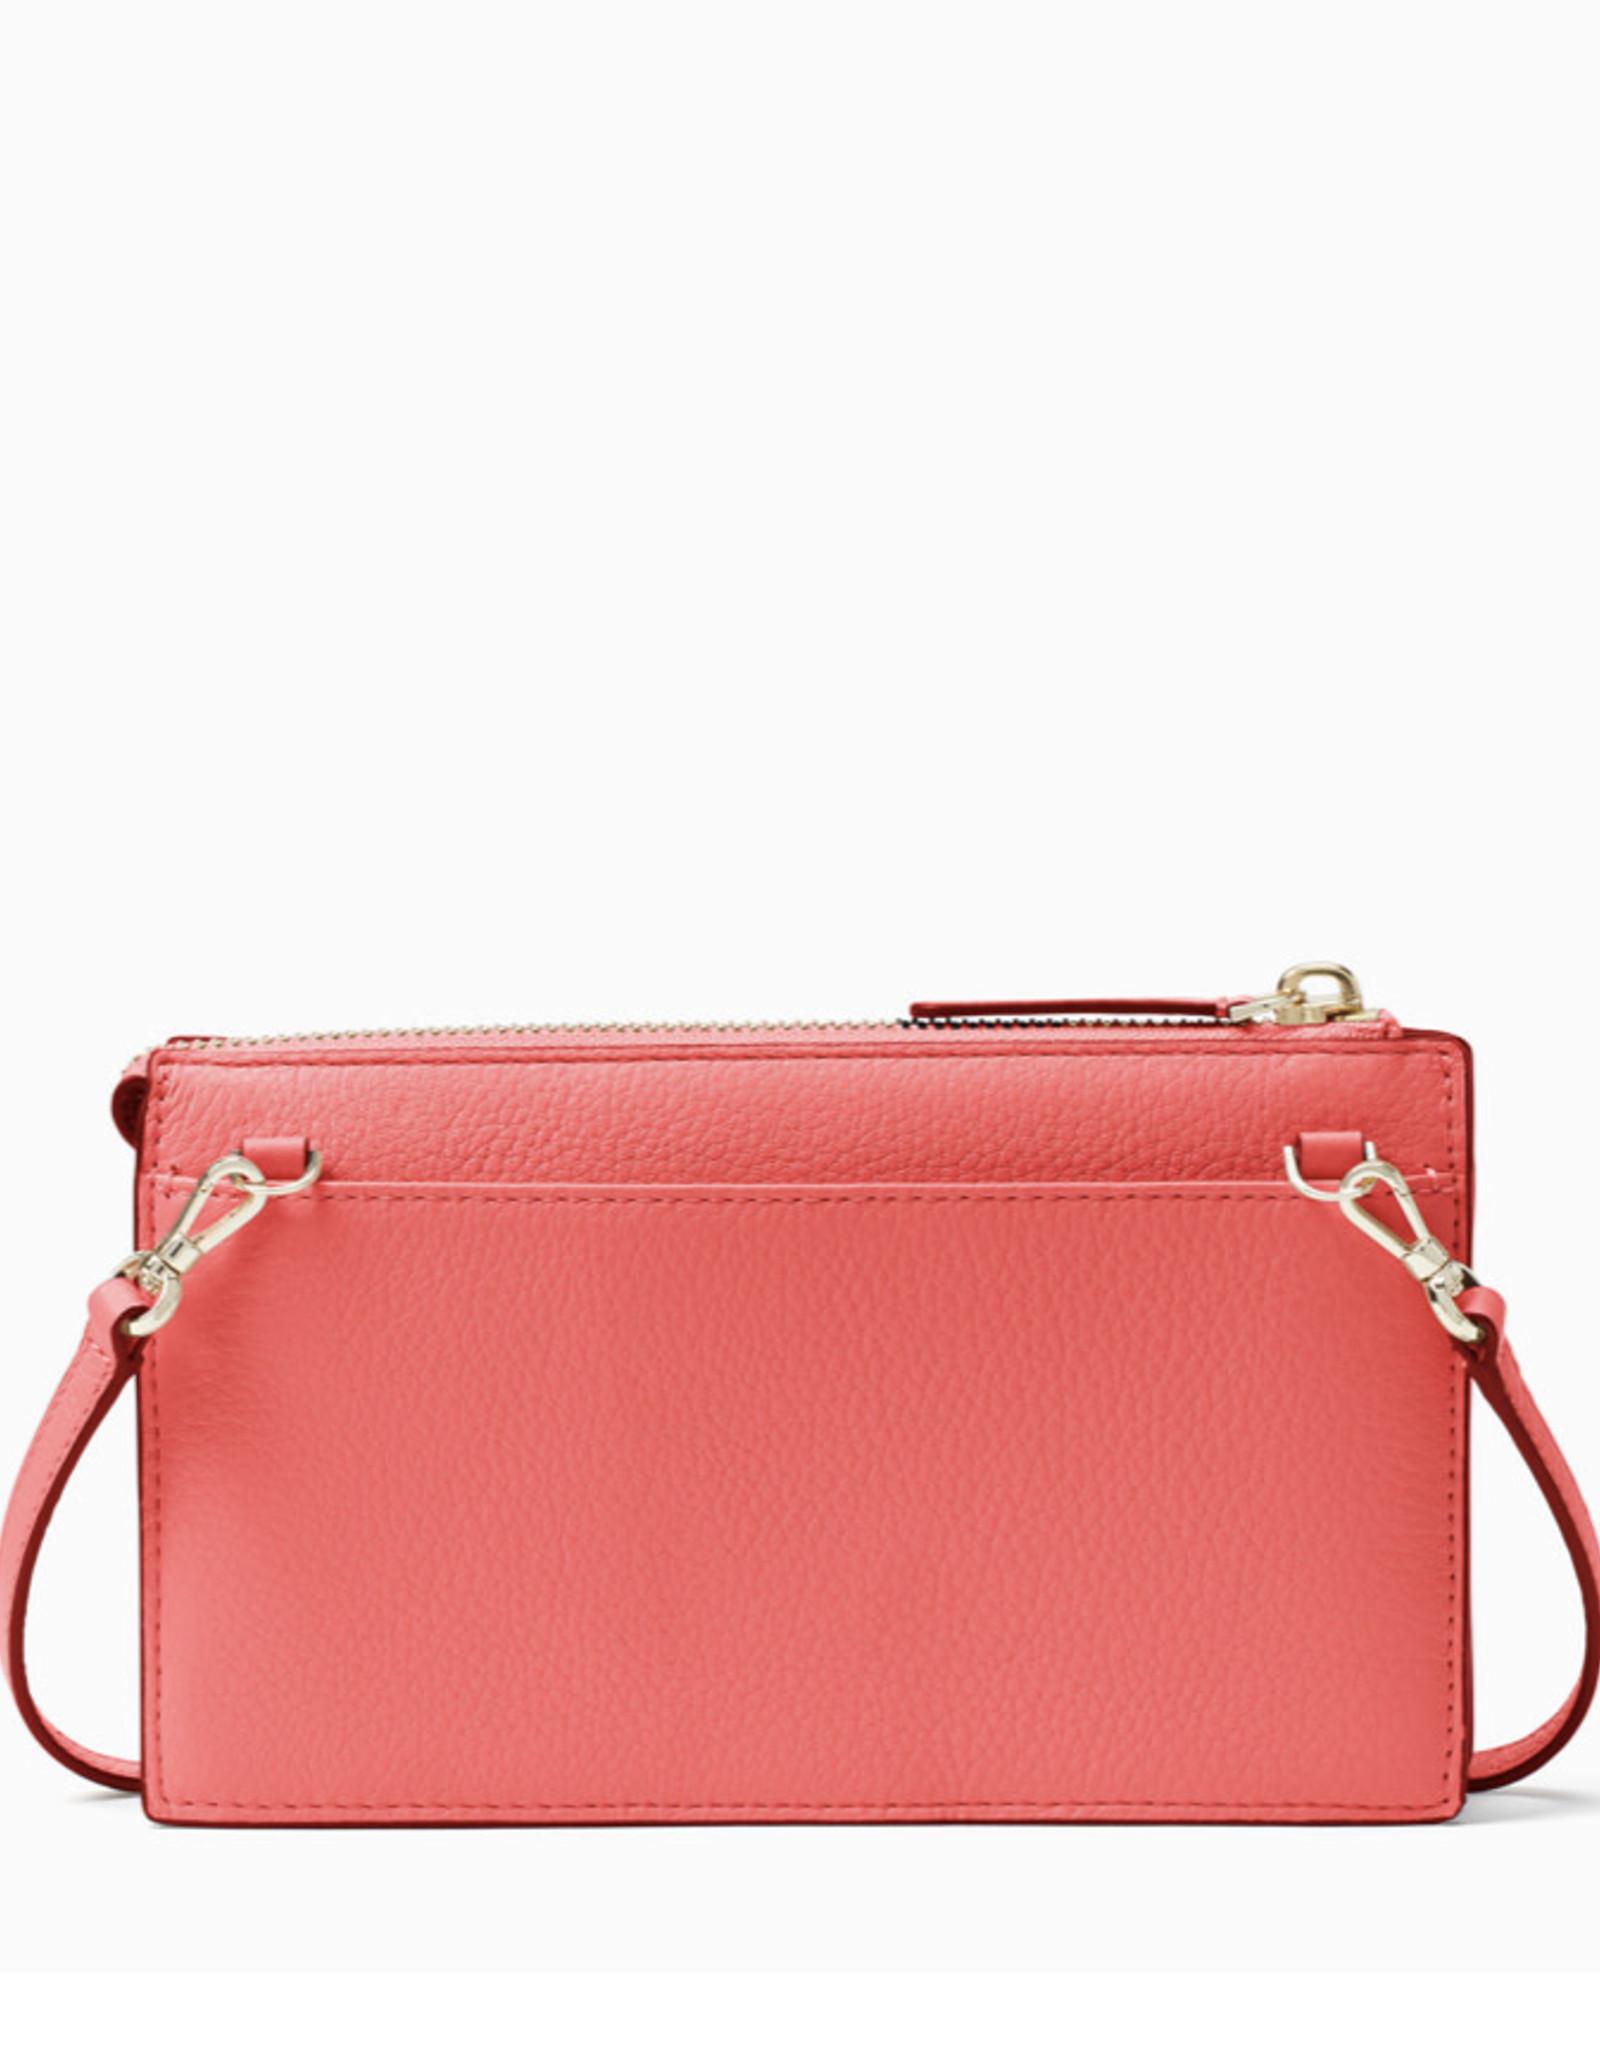 Kate Spade Kate Spade Jackson Small Tab Wallet Crossbody with Zip Closure